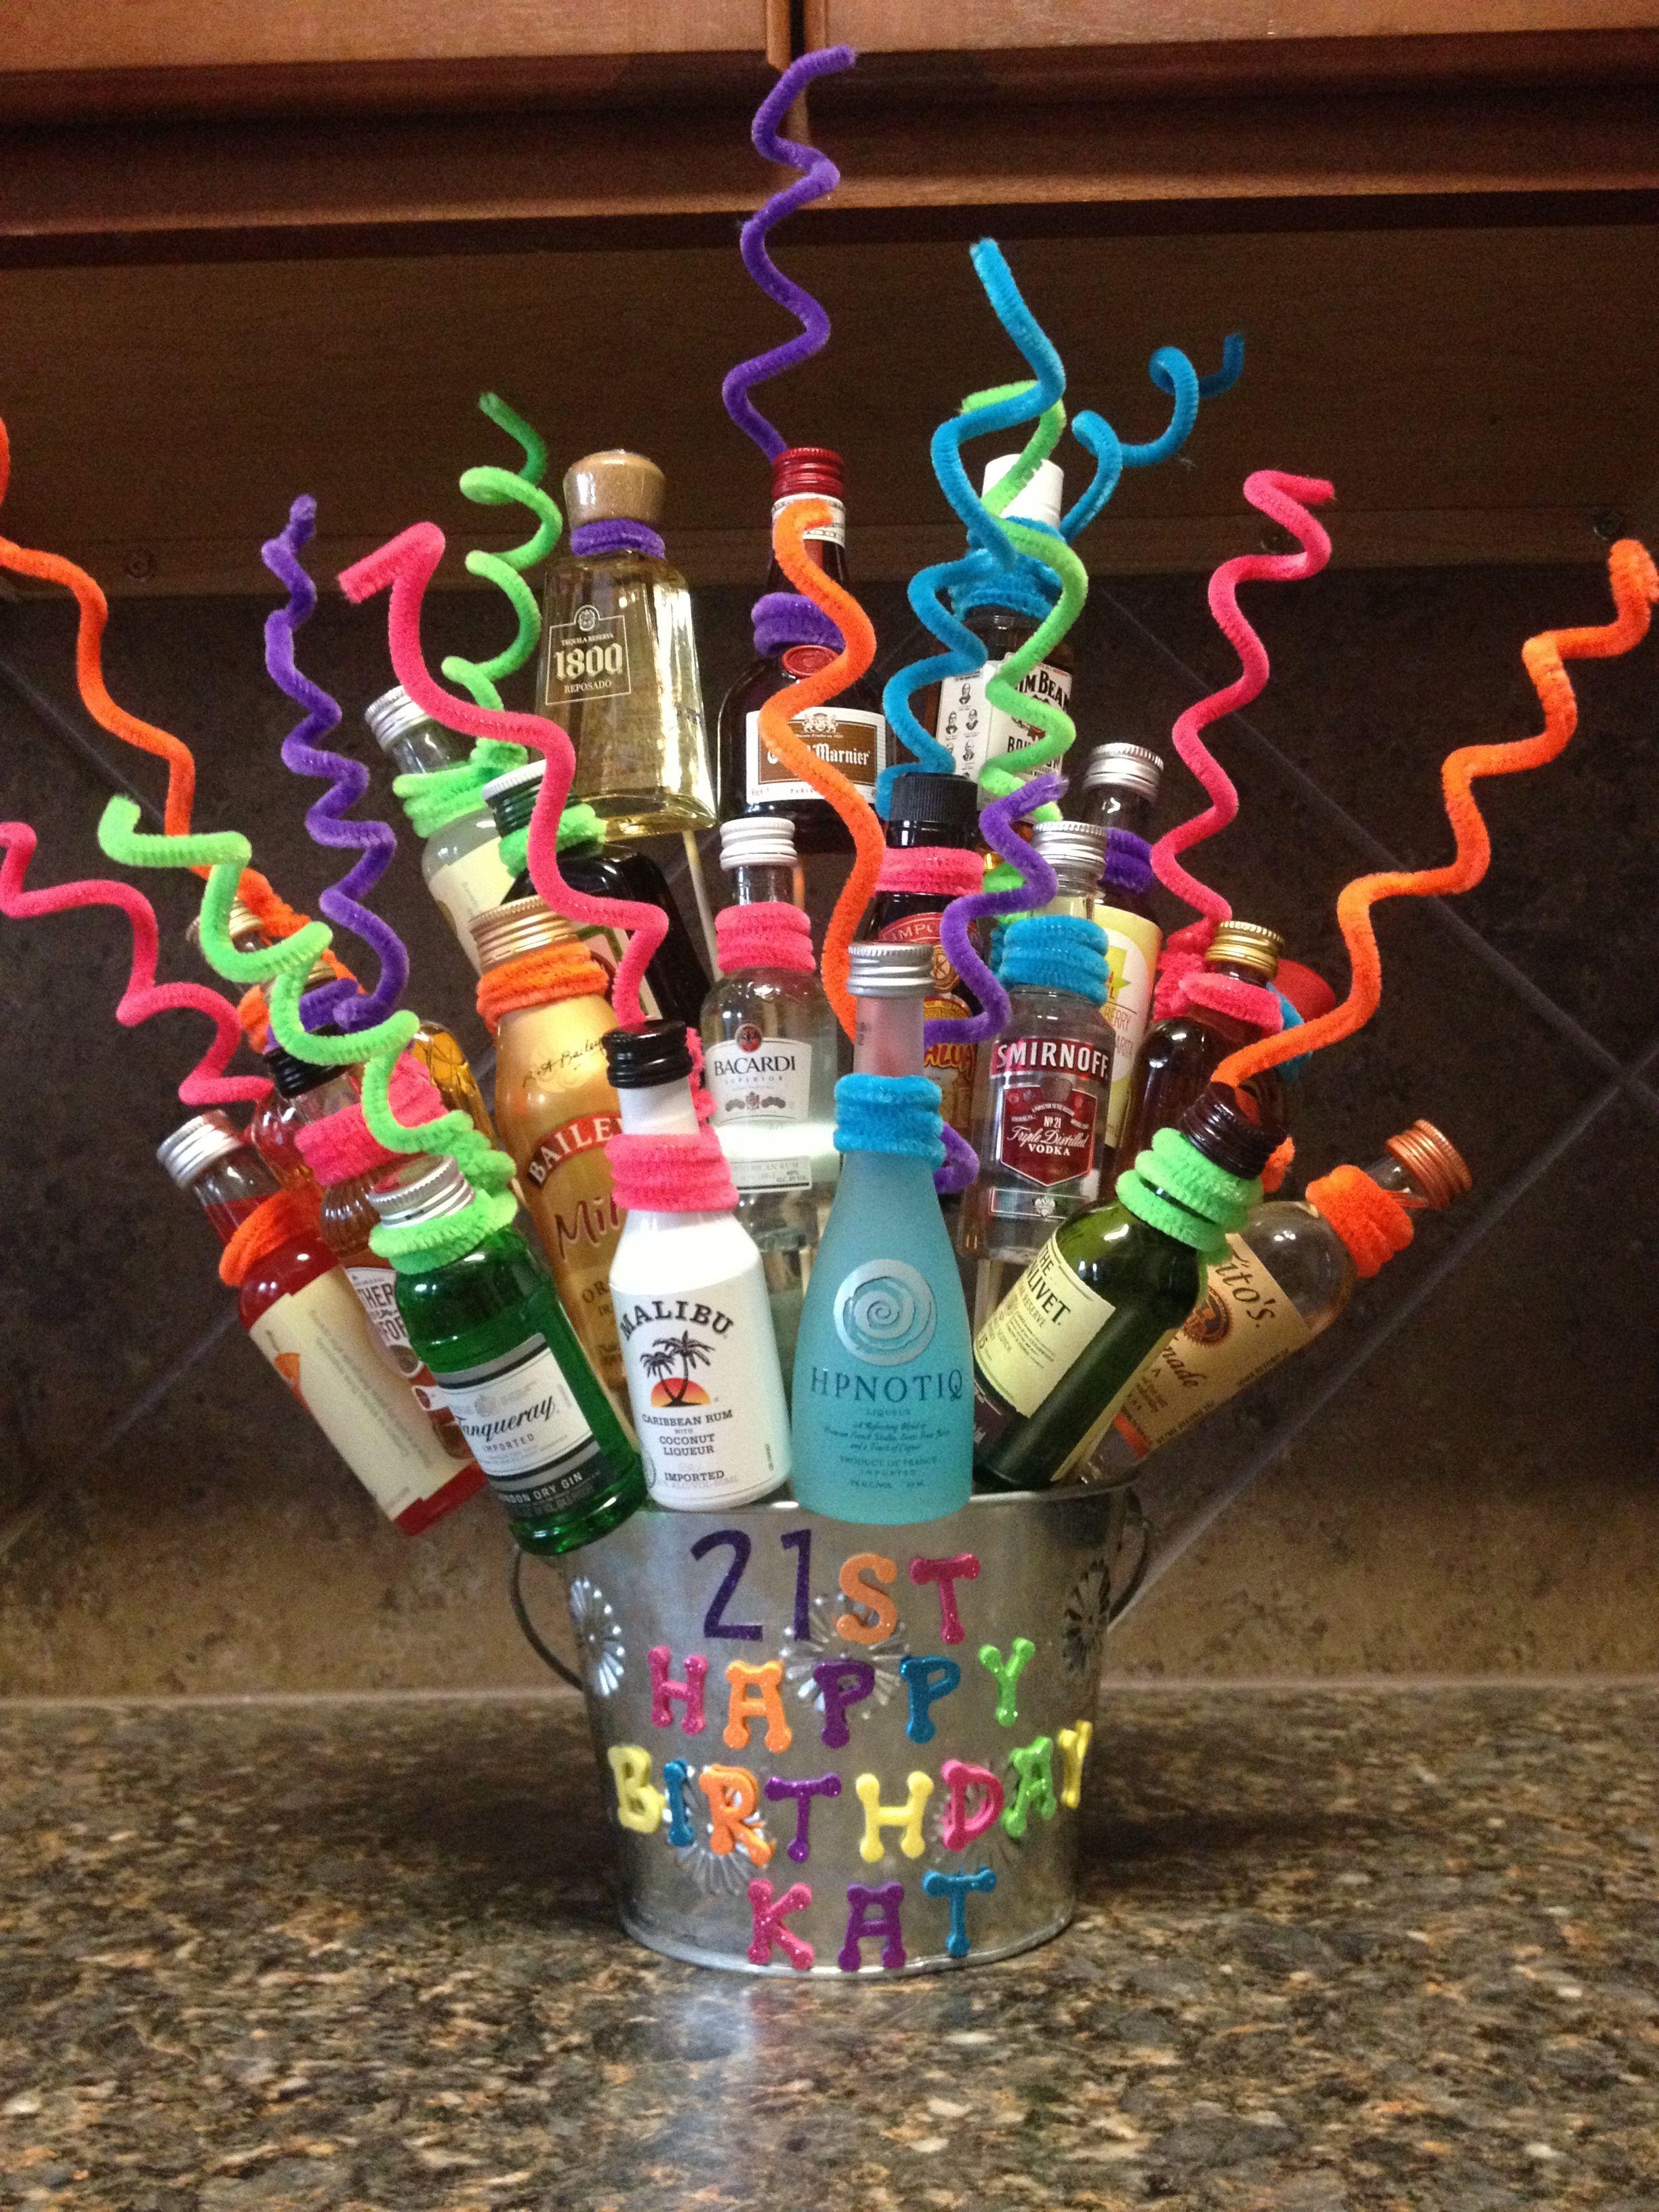 Katherine S 21st Birthday Present My Husband And I Made